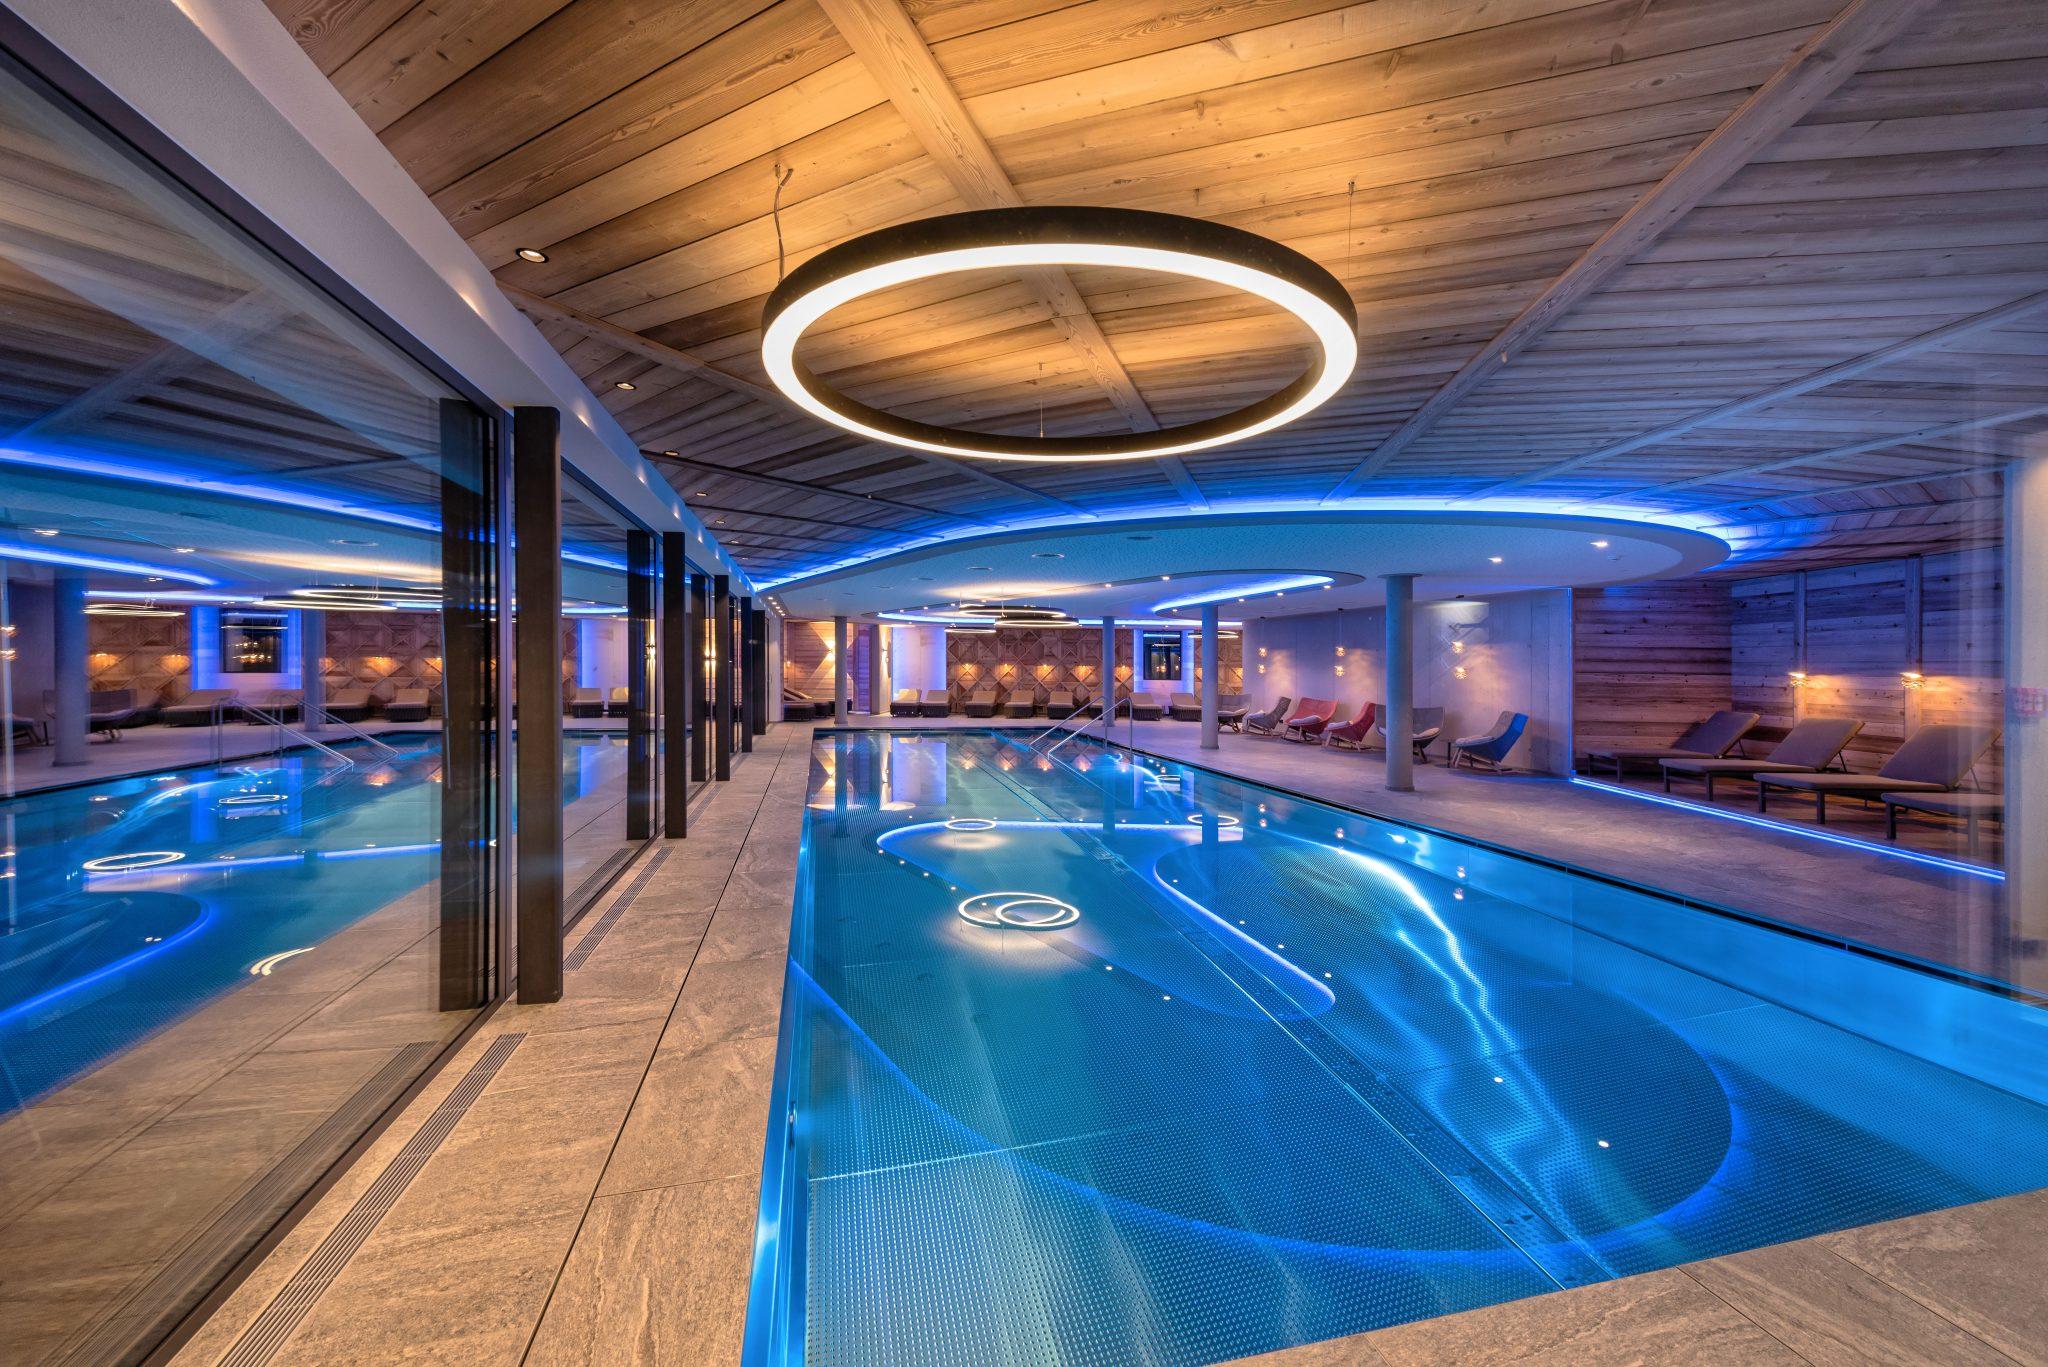 indoor_panorama_swimming_pool_mit_exklusiver_lichtinstallation_alpinhotel_berghaus